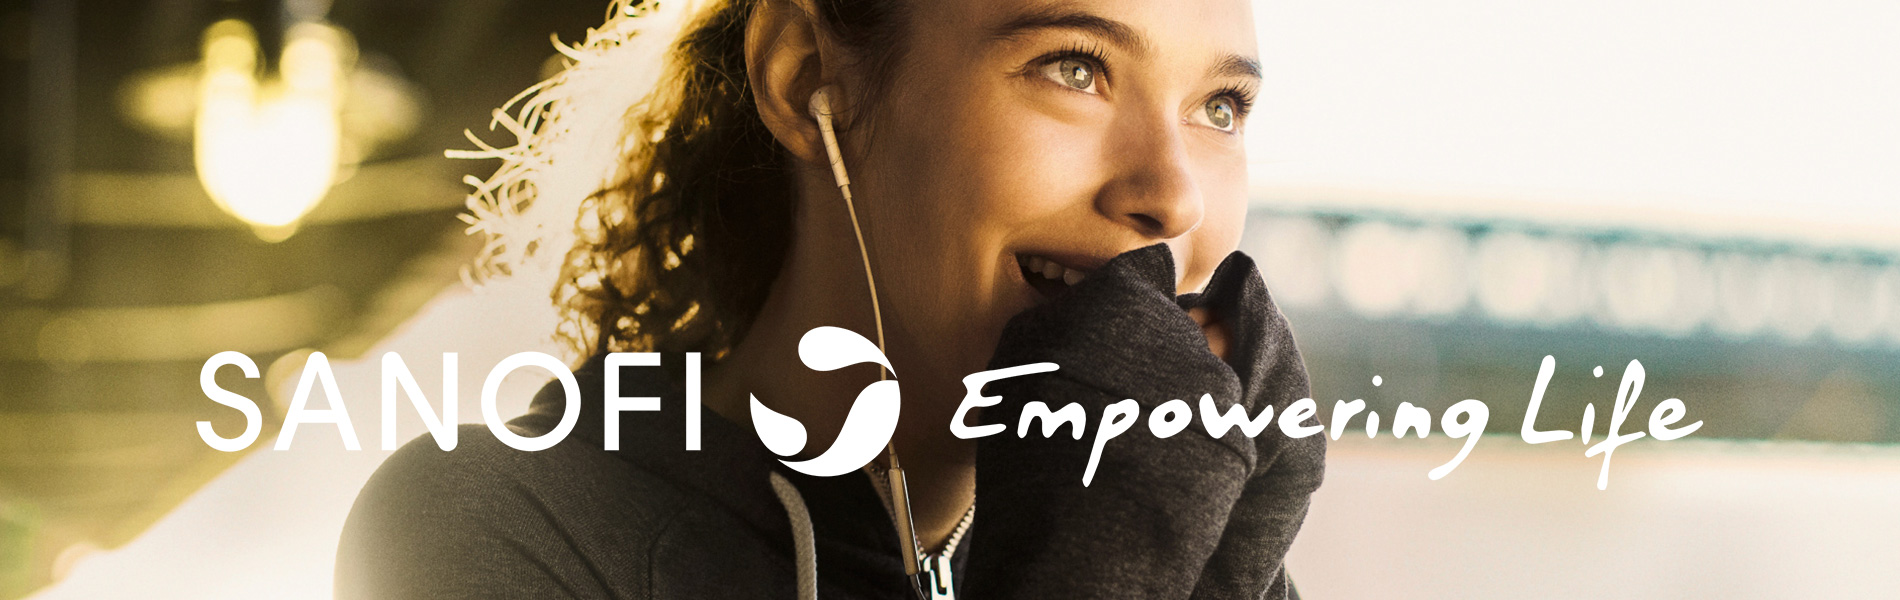 Sanofi - Empowering Life